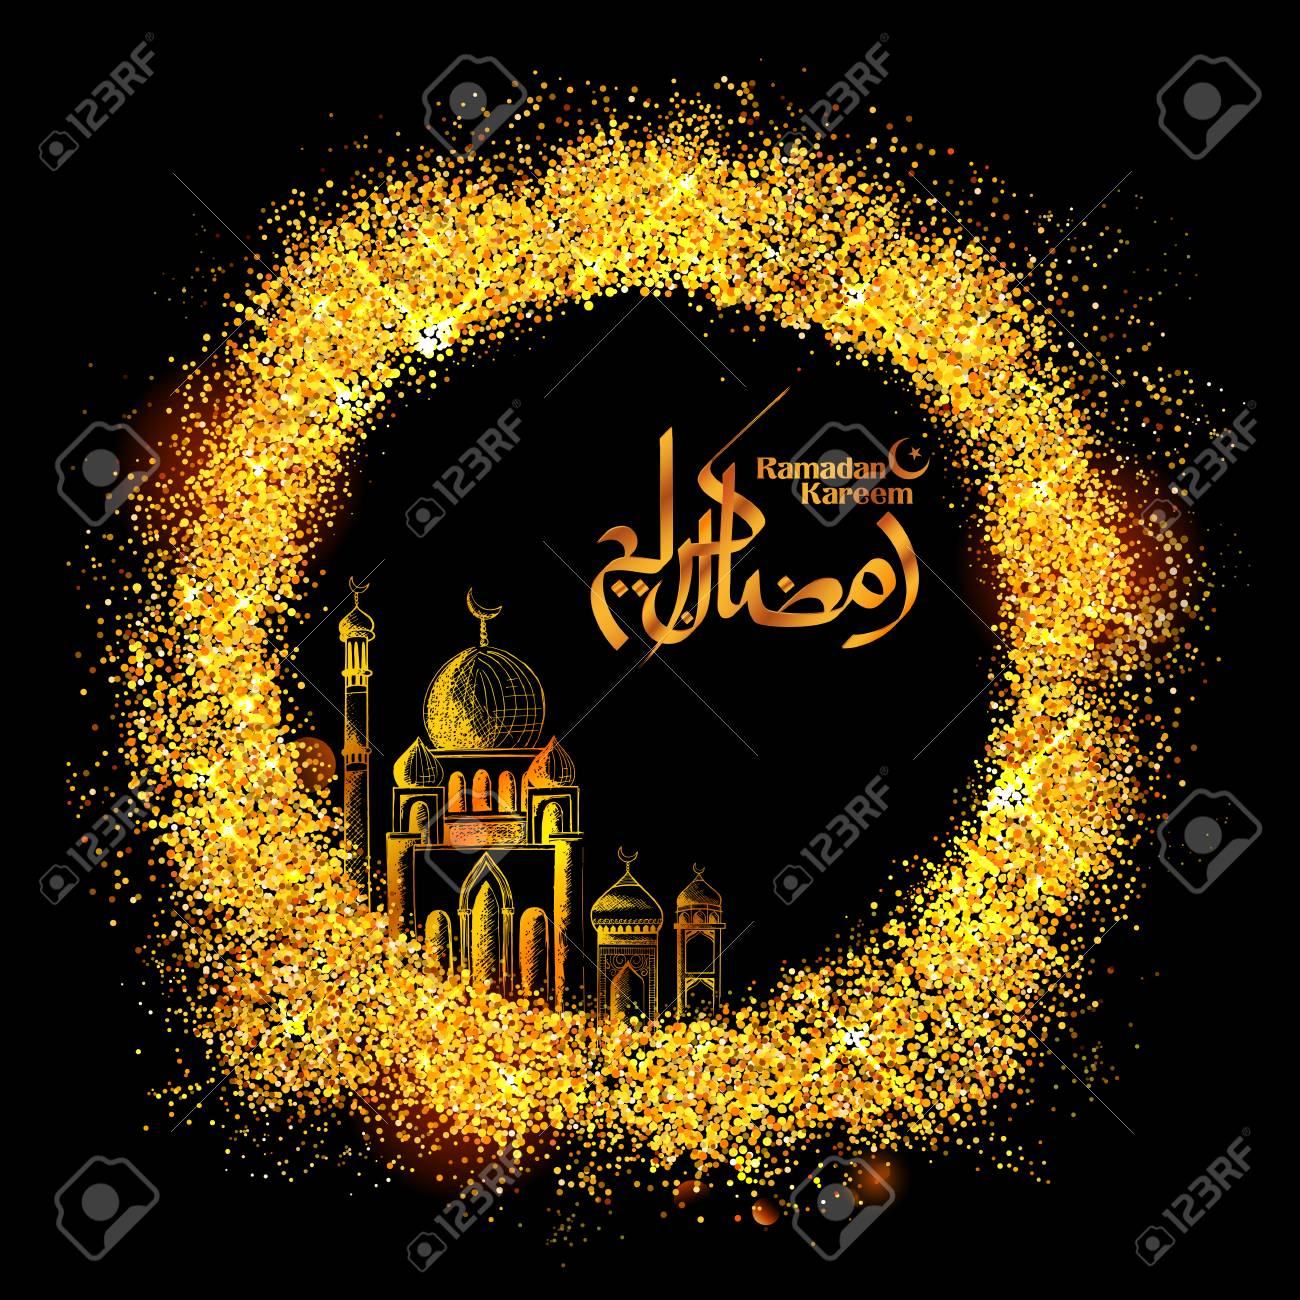 Ramadan kareem generous ramadan greetings in arabic freehand stock ramadan kareem generous ramadan greetings in arabic freehand with mosque stock photo 80109706 kristyandbryce Images